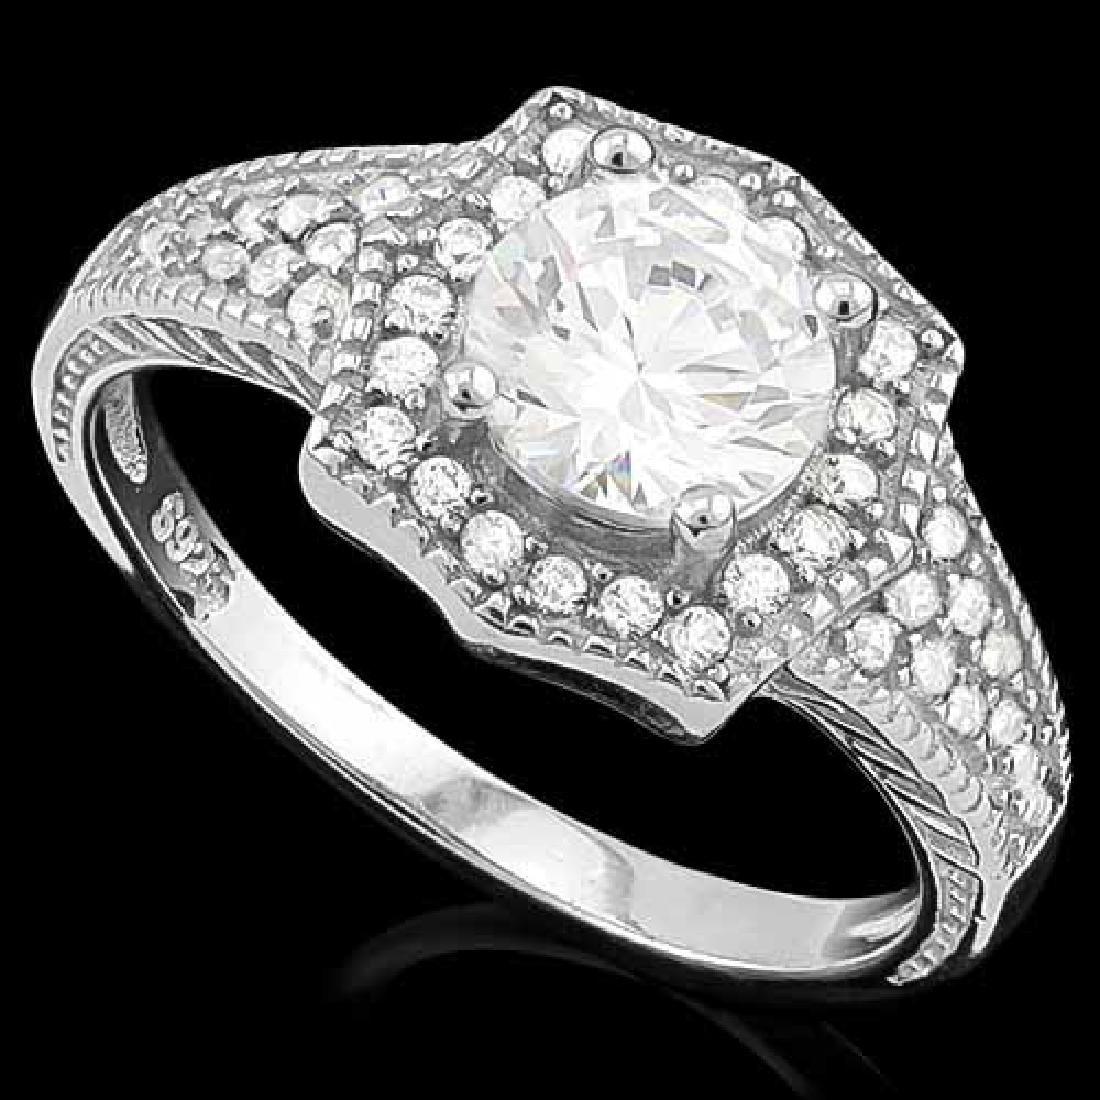 1 3/5 CARAT (41 PCS) FLAWLESS CREATED DIAMOND 925 STERL